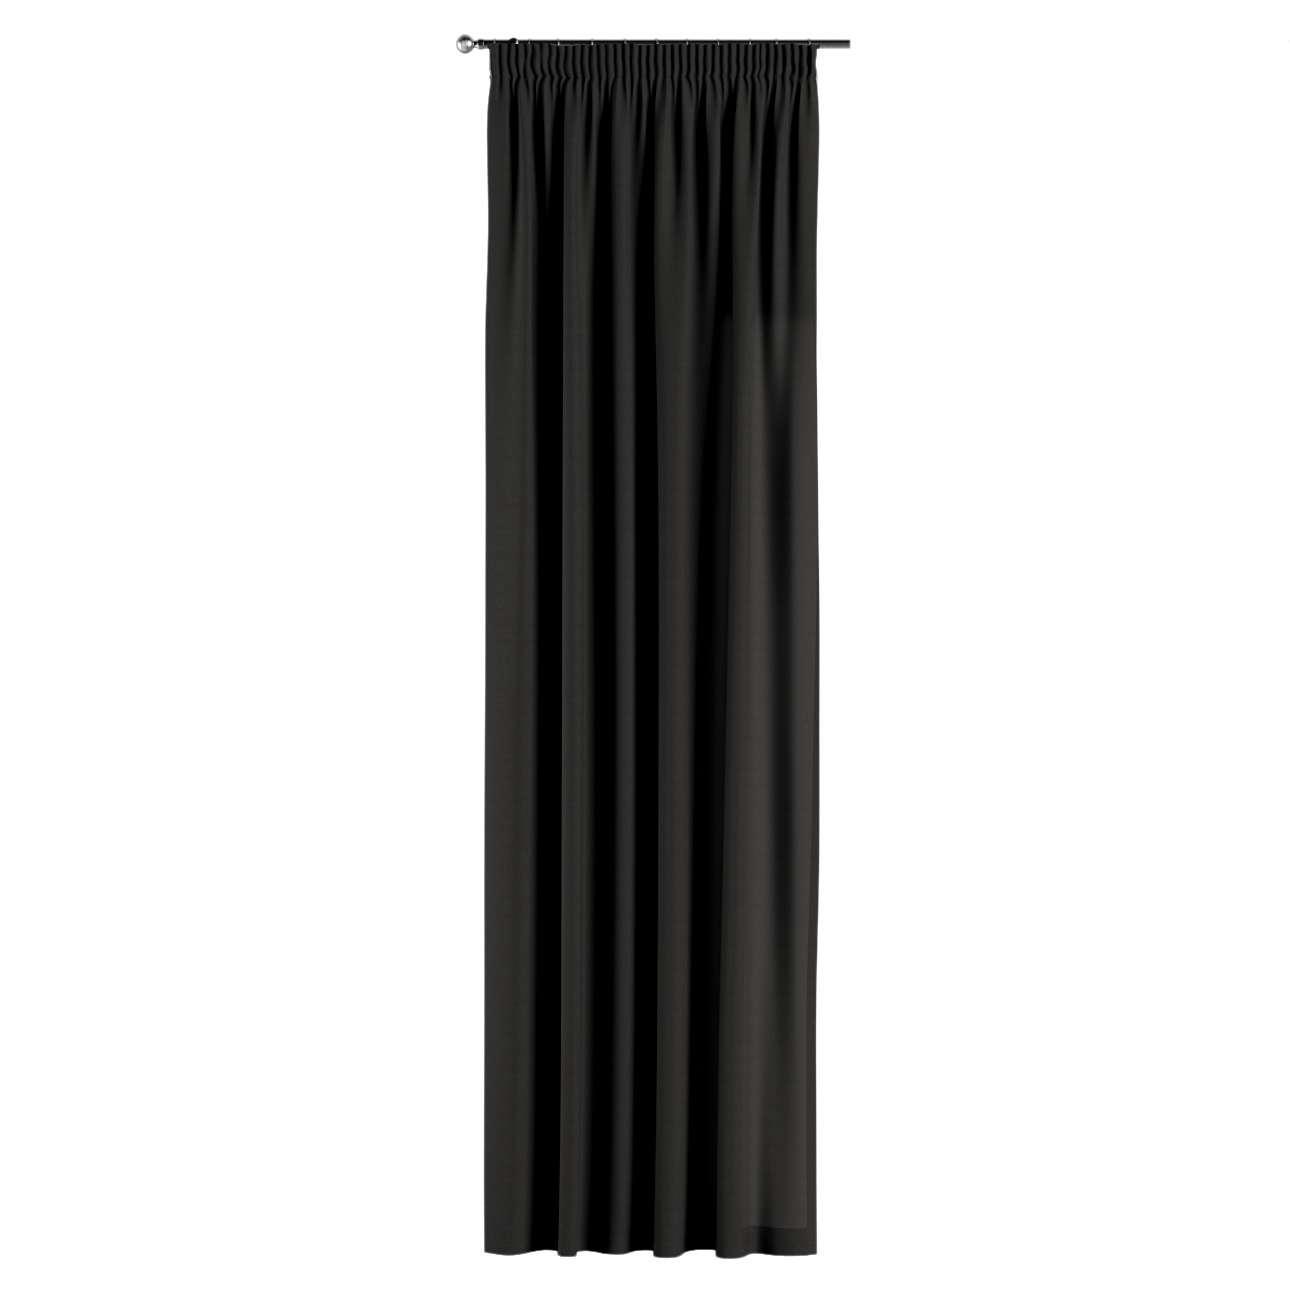 Gardin med rynkband 1 längd 130 x 260 cm i kollektionen Panama Cotton , Tyg: 702-08